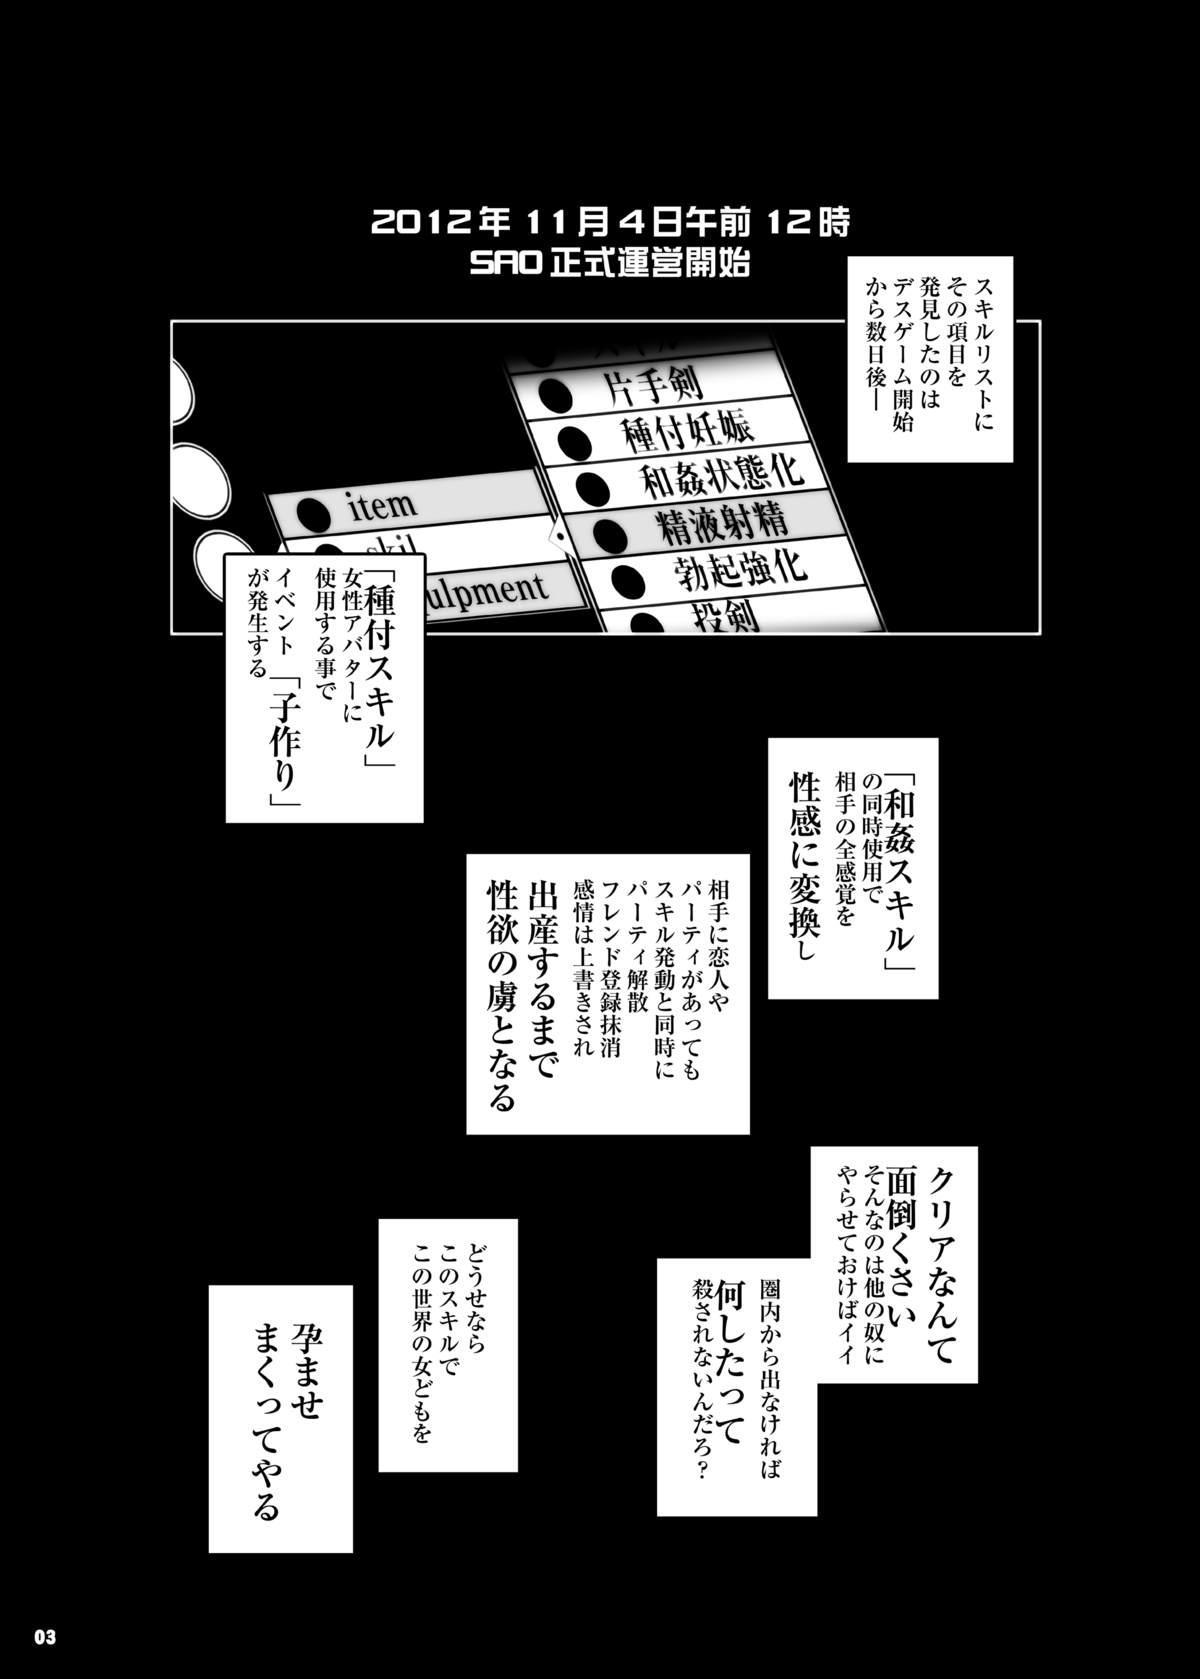 [Suitekiya (Suiteki-ka Yū-min)]Kennai Mating Scandal (1: Einclad / 2: Fairy Dance) SAO The Complete (Sword Art Online) 2